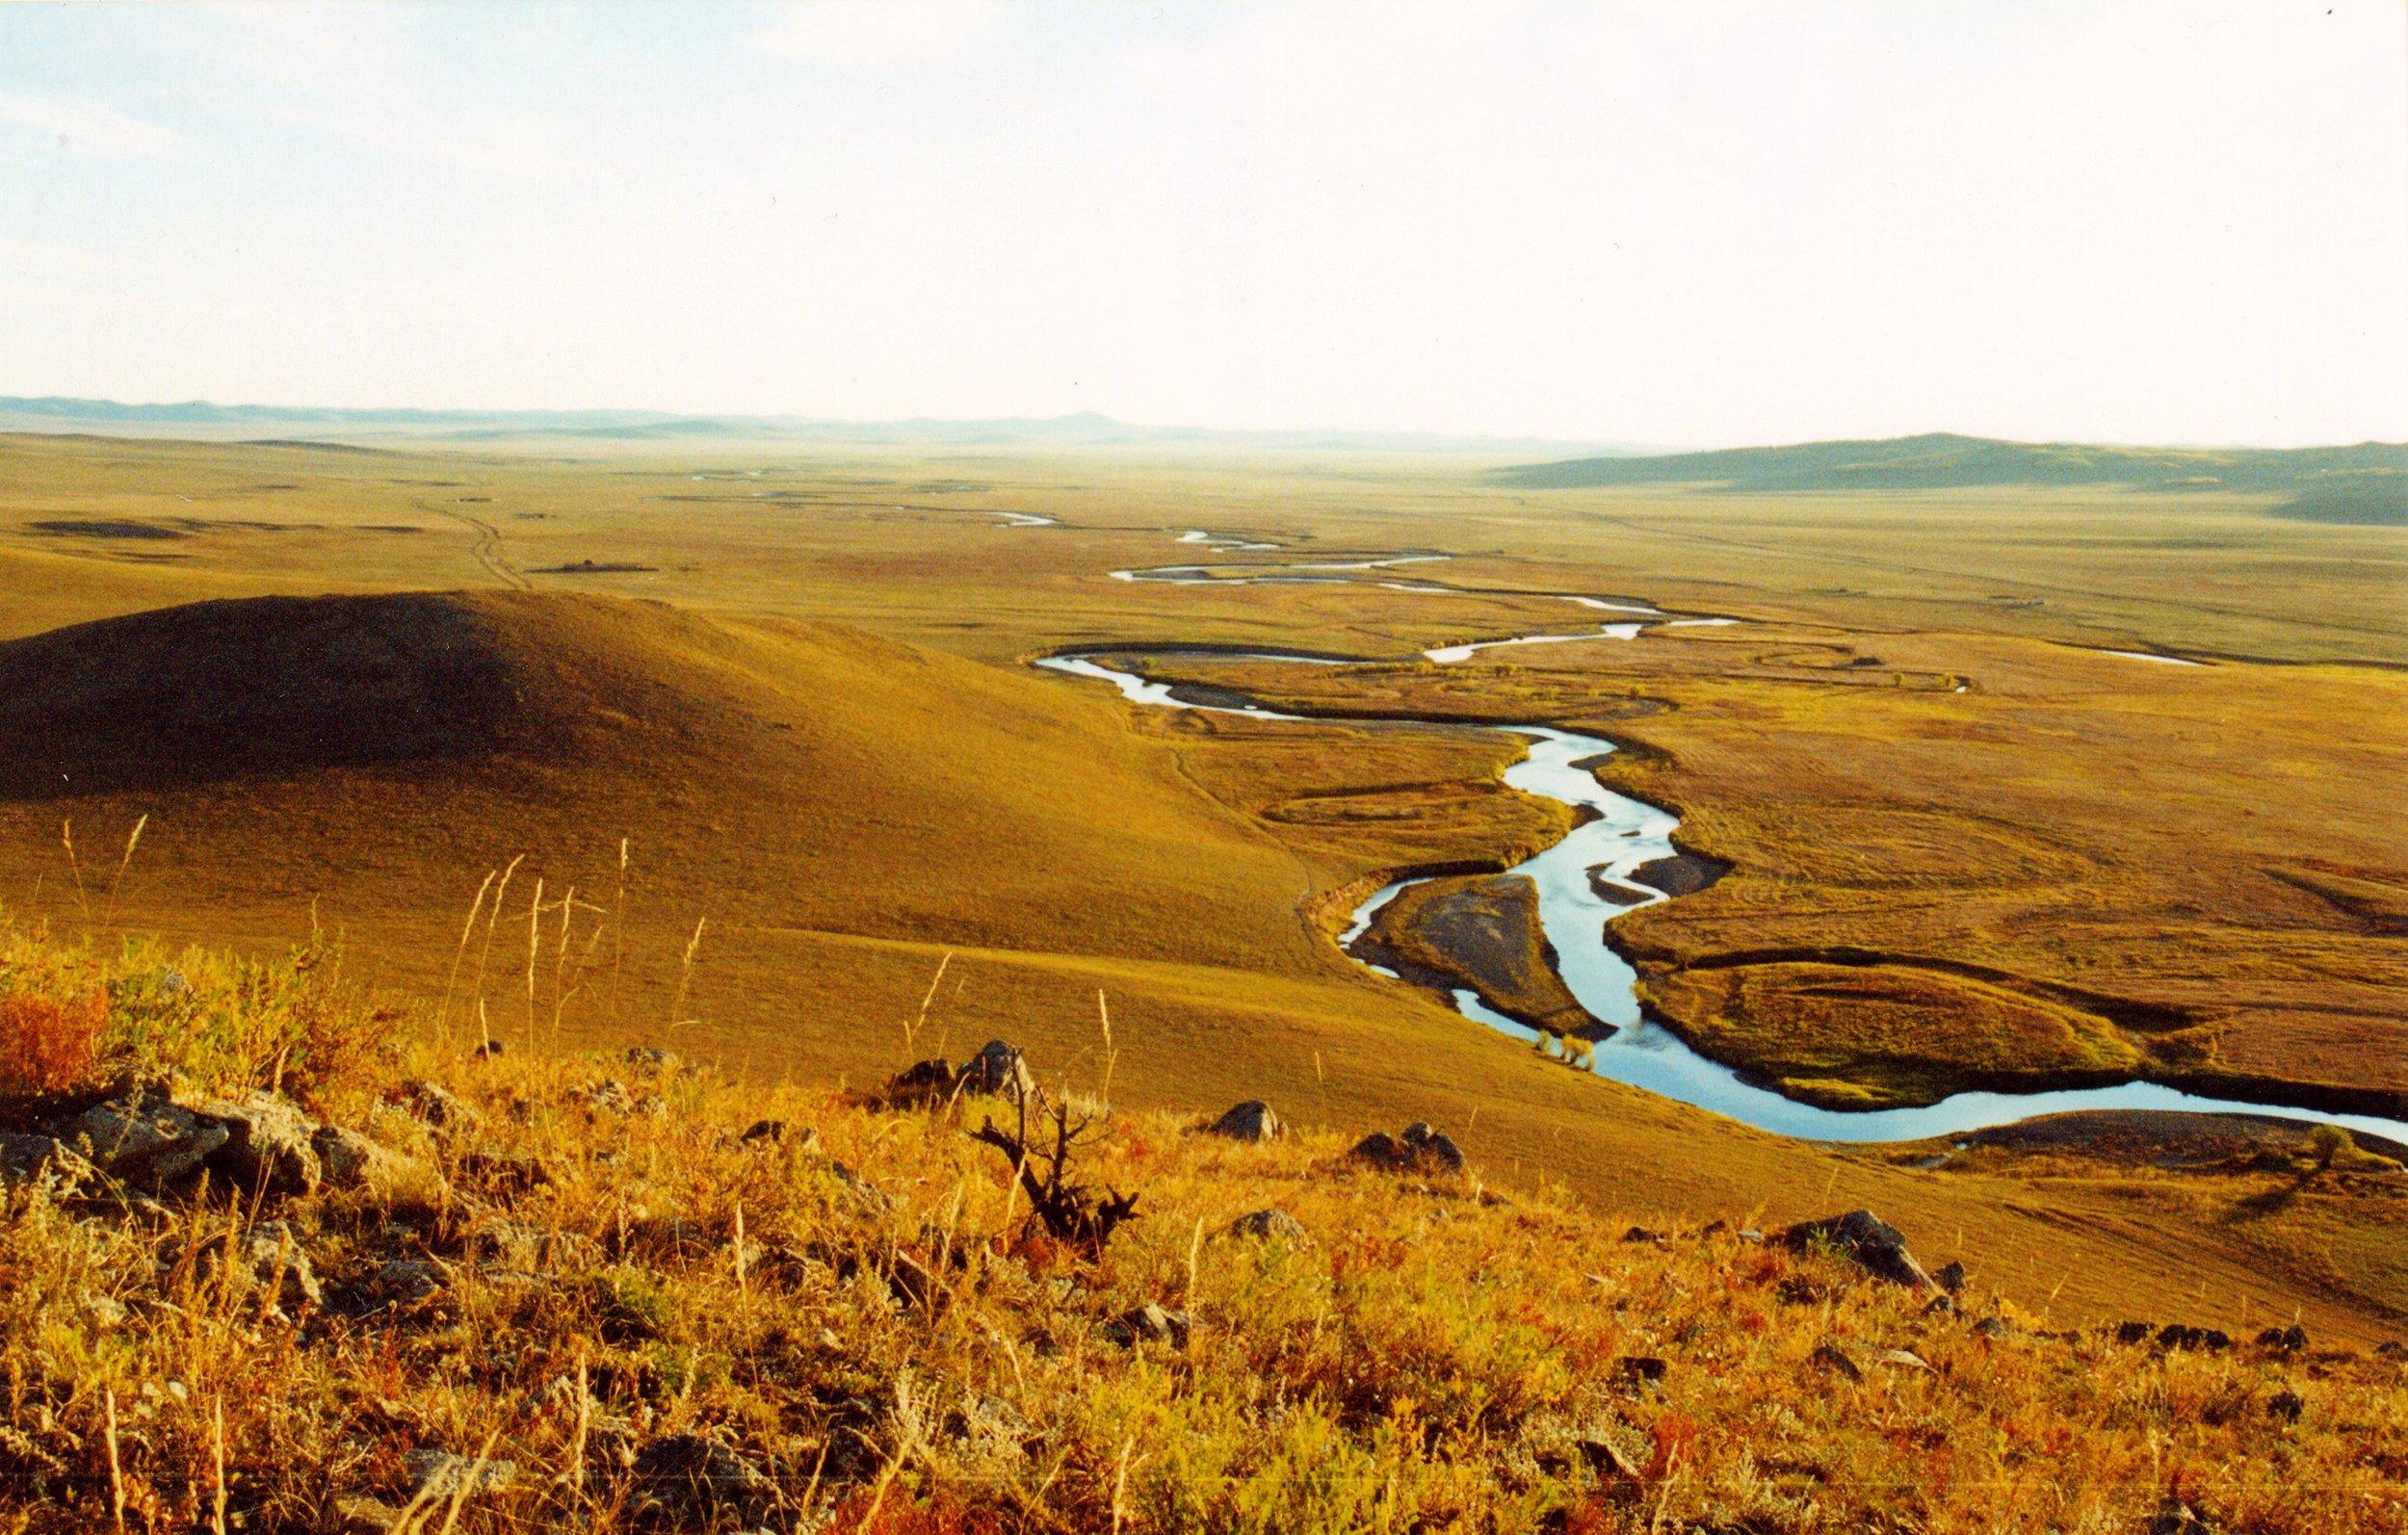 The floodplain of the upper Ulz river in eastern Mongolia, in the Dornod Mongol strictly protected area (Image: Oleg Goroshko)